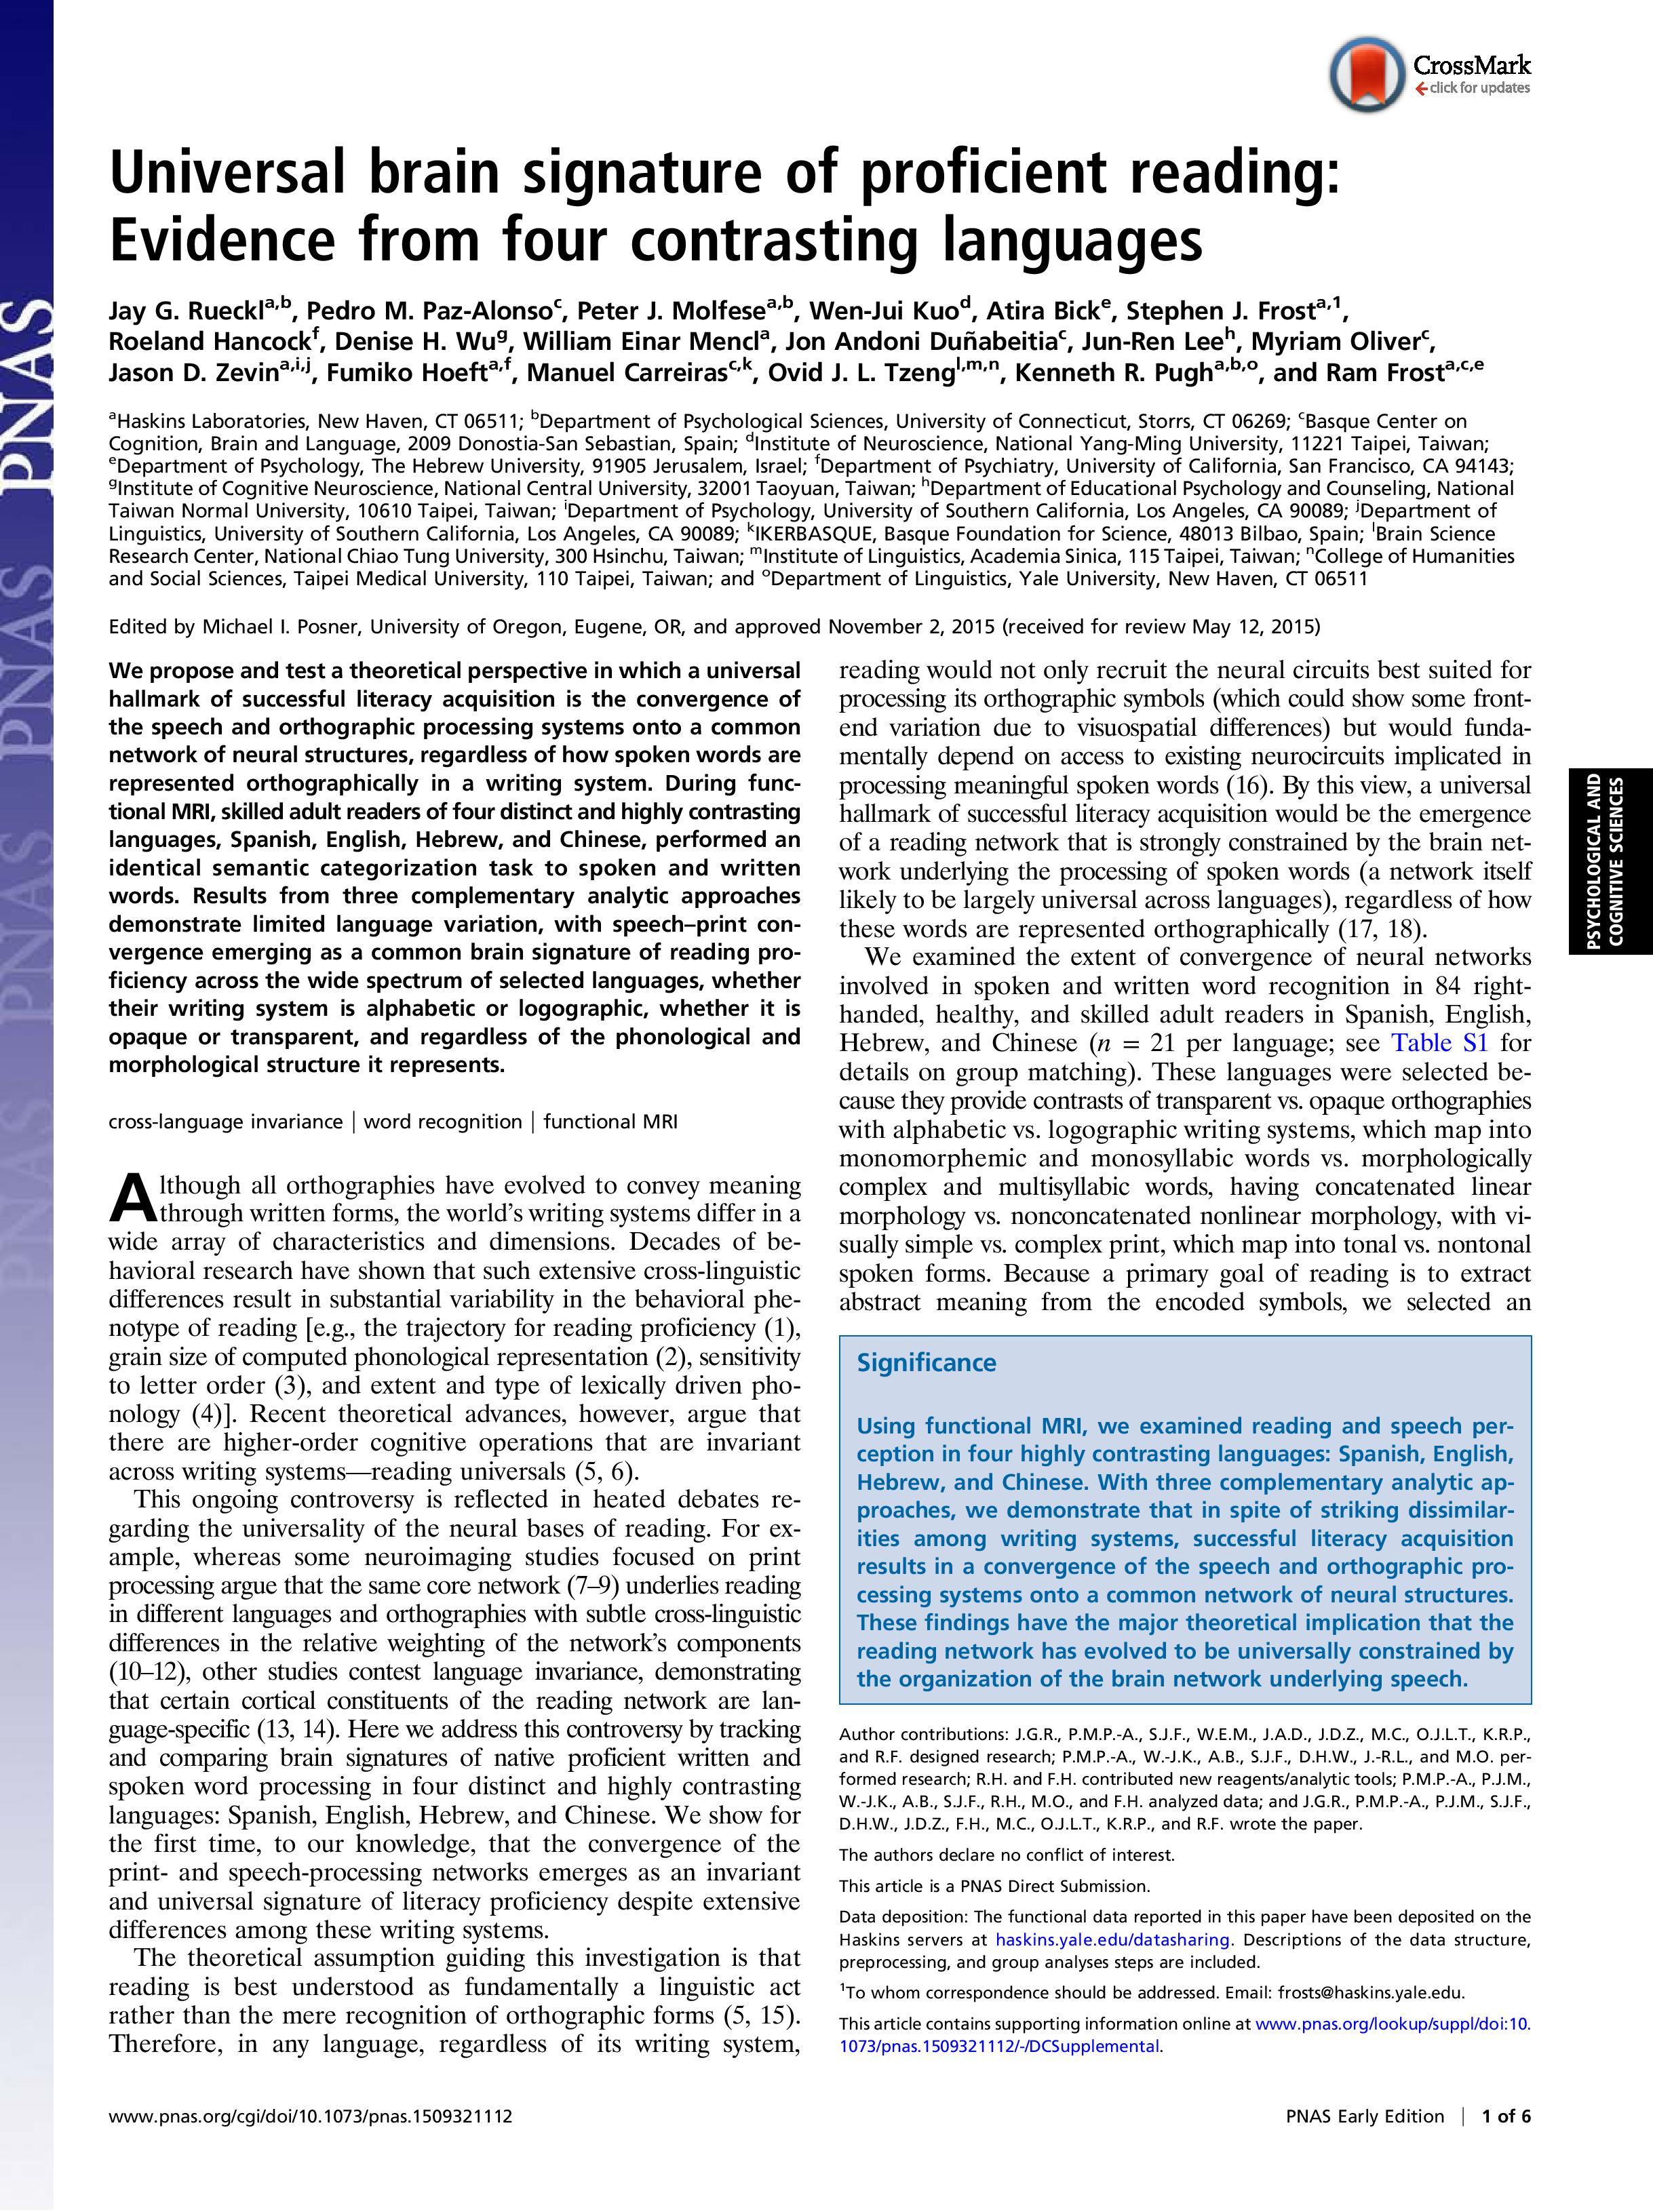 PNAS-2015-Rueckl-1509321112 (1)-page-001.jpg